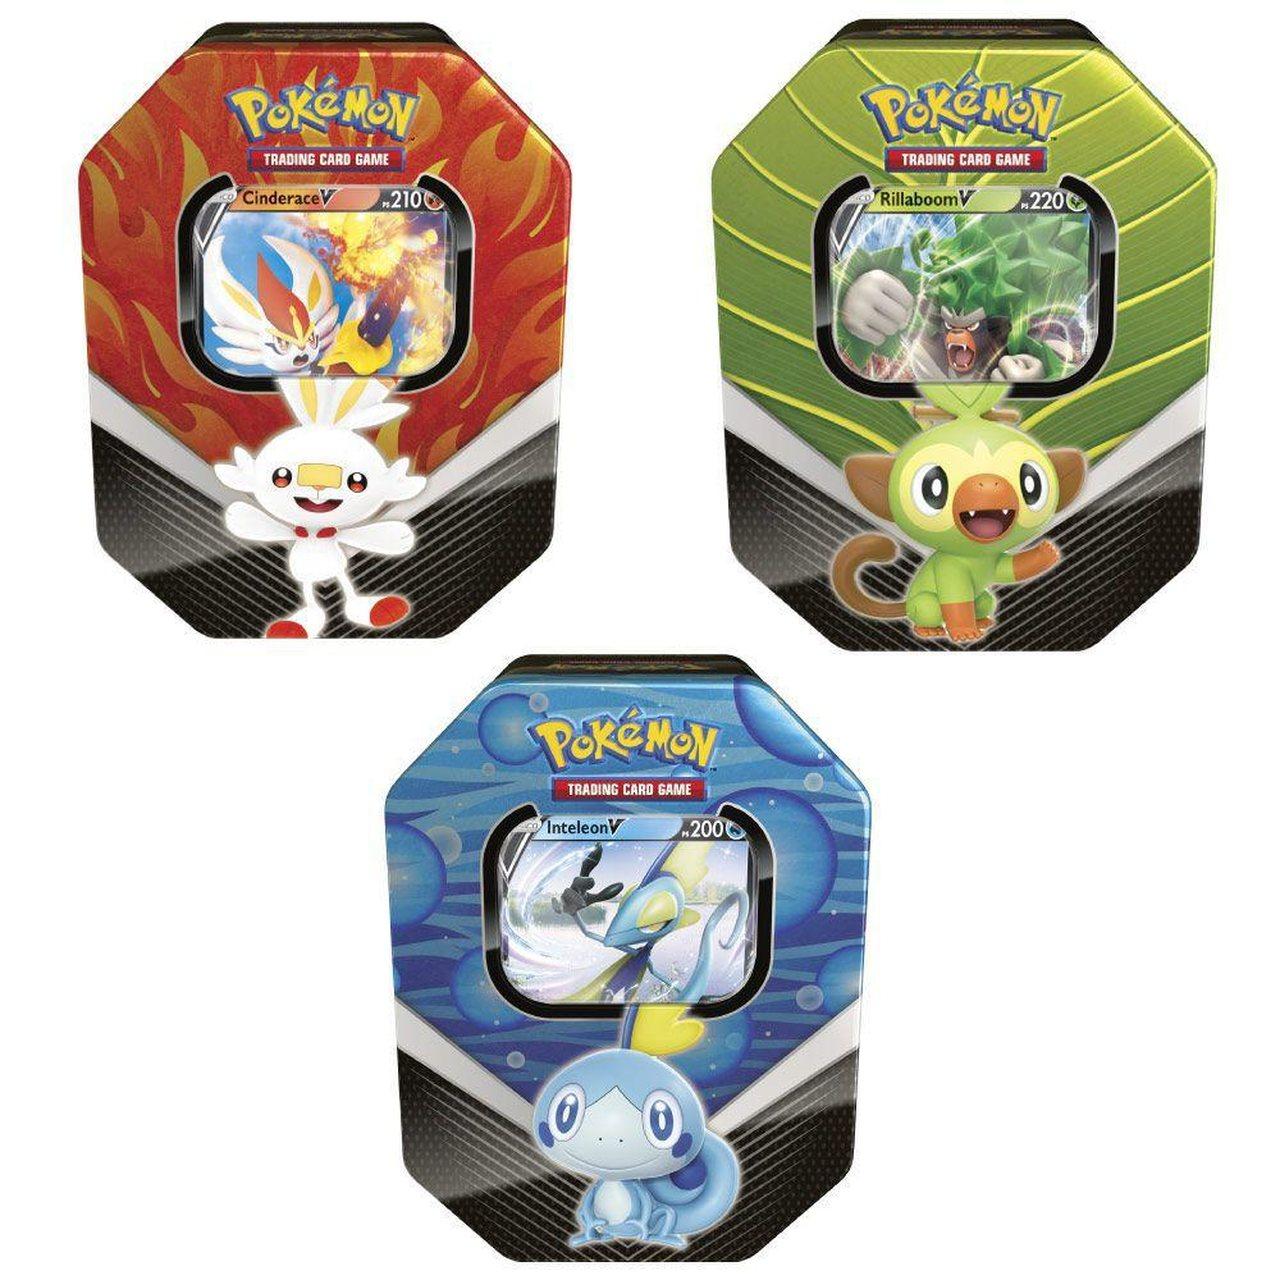 Pokémon - 3 Latas Galar V - Rillaboom Inteleon e Cinderace